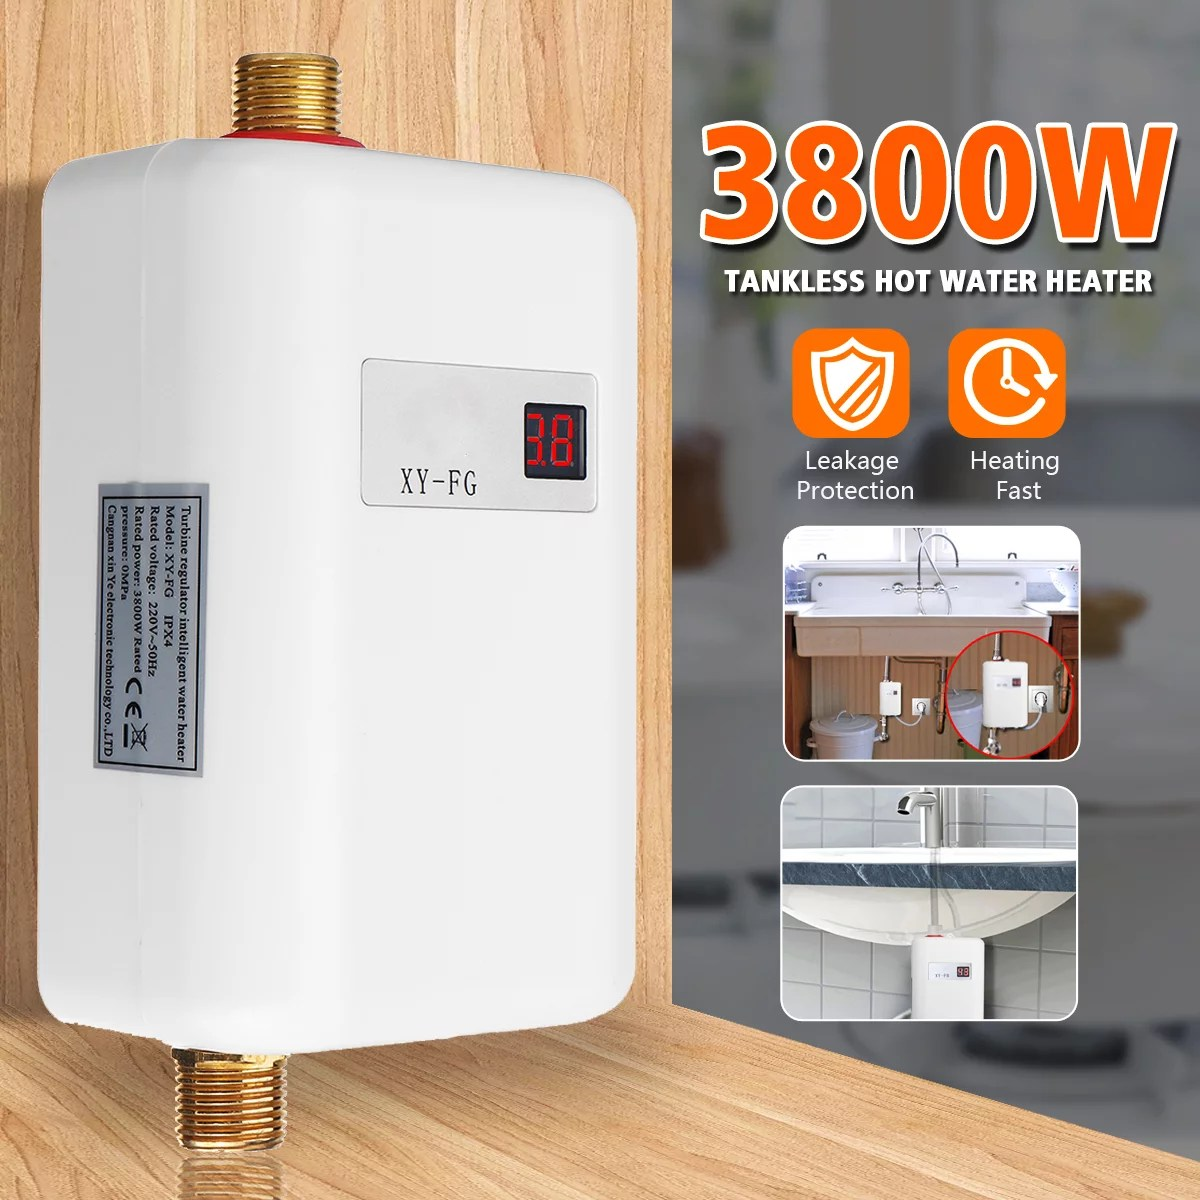 Mini Tankless Instant Hot Water Heater Bathroom Faucet Tap Heating 3800w Walmart Com Walmart Com